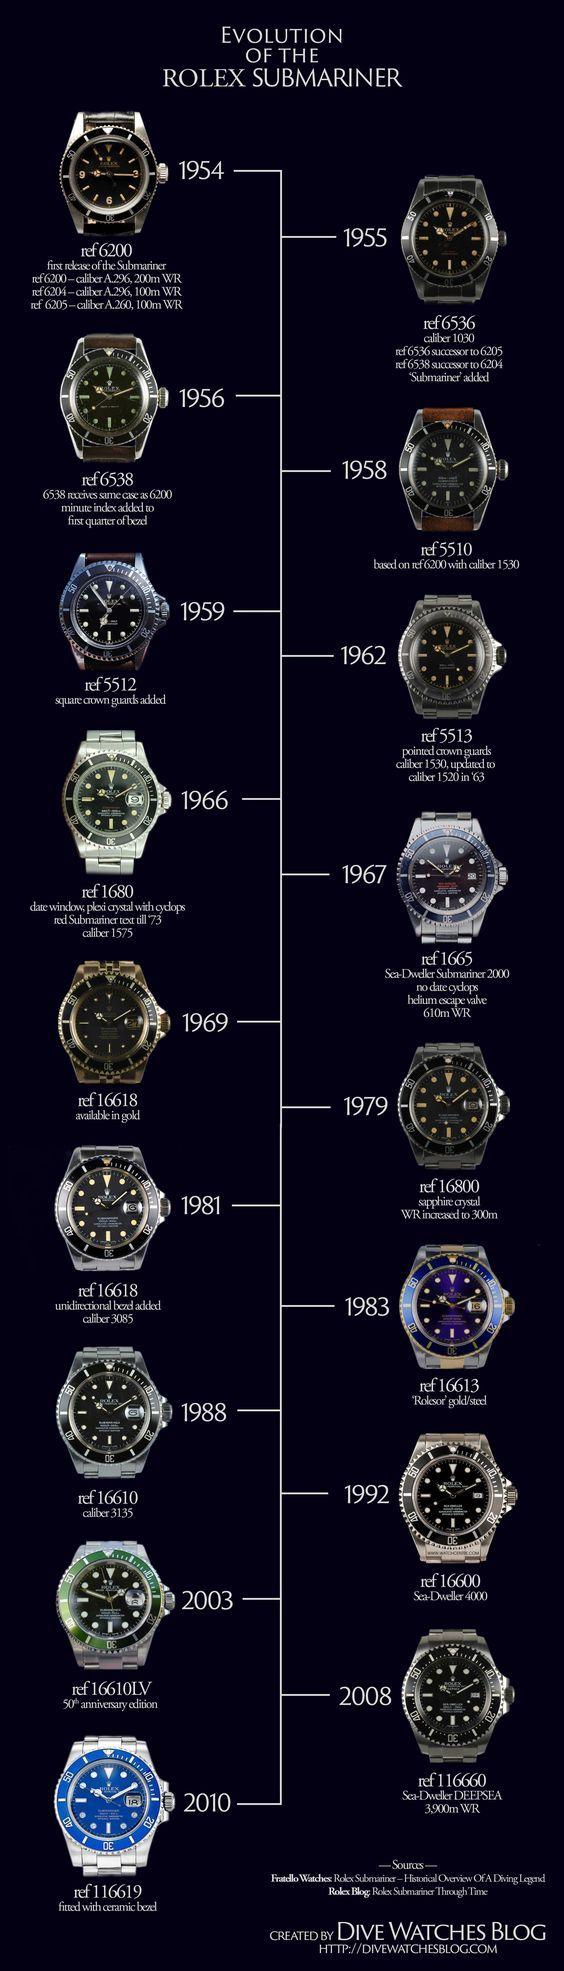 Evolution of the Rolex Submariner – a helpful infographic showcasing the gradu...